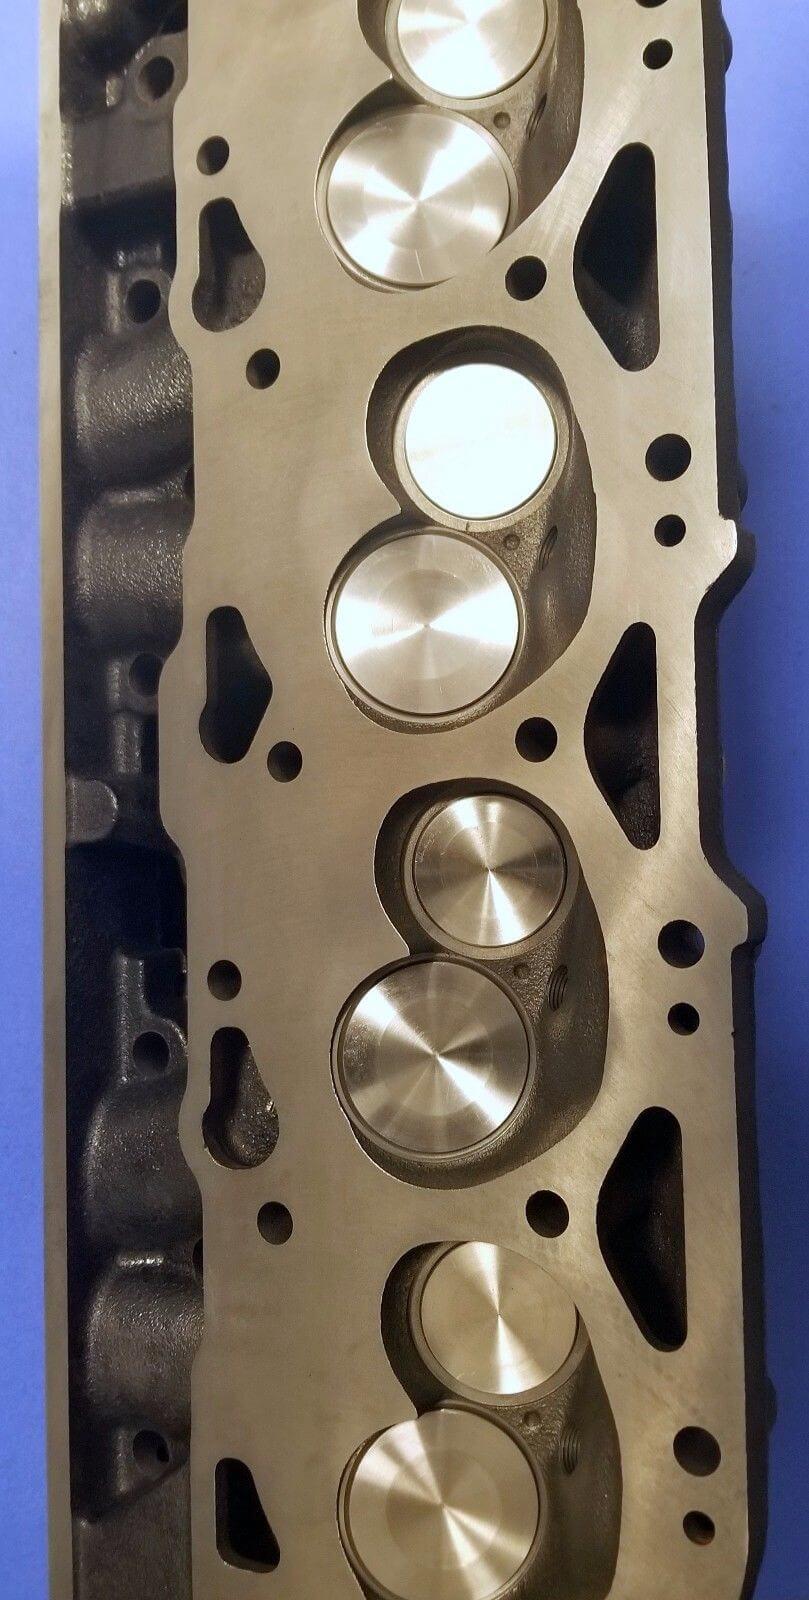 NEW GM MARINE BBC 7 4 454 OVAL PORT CONVERSION CYLINDER HEAD CAST#236 360  045